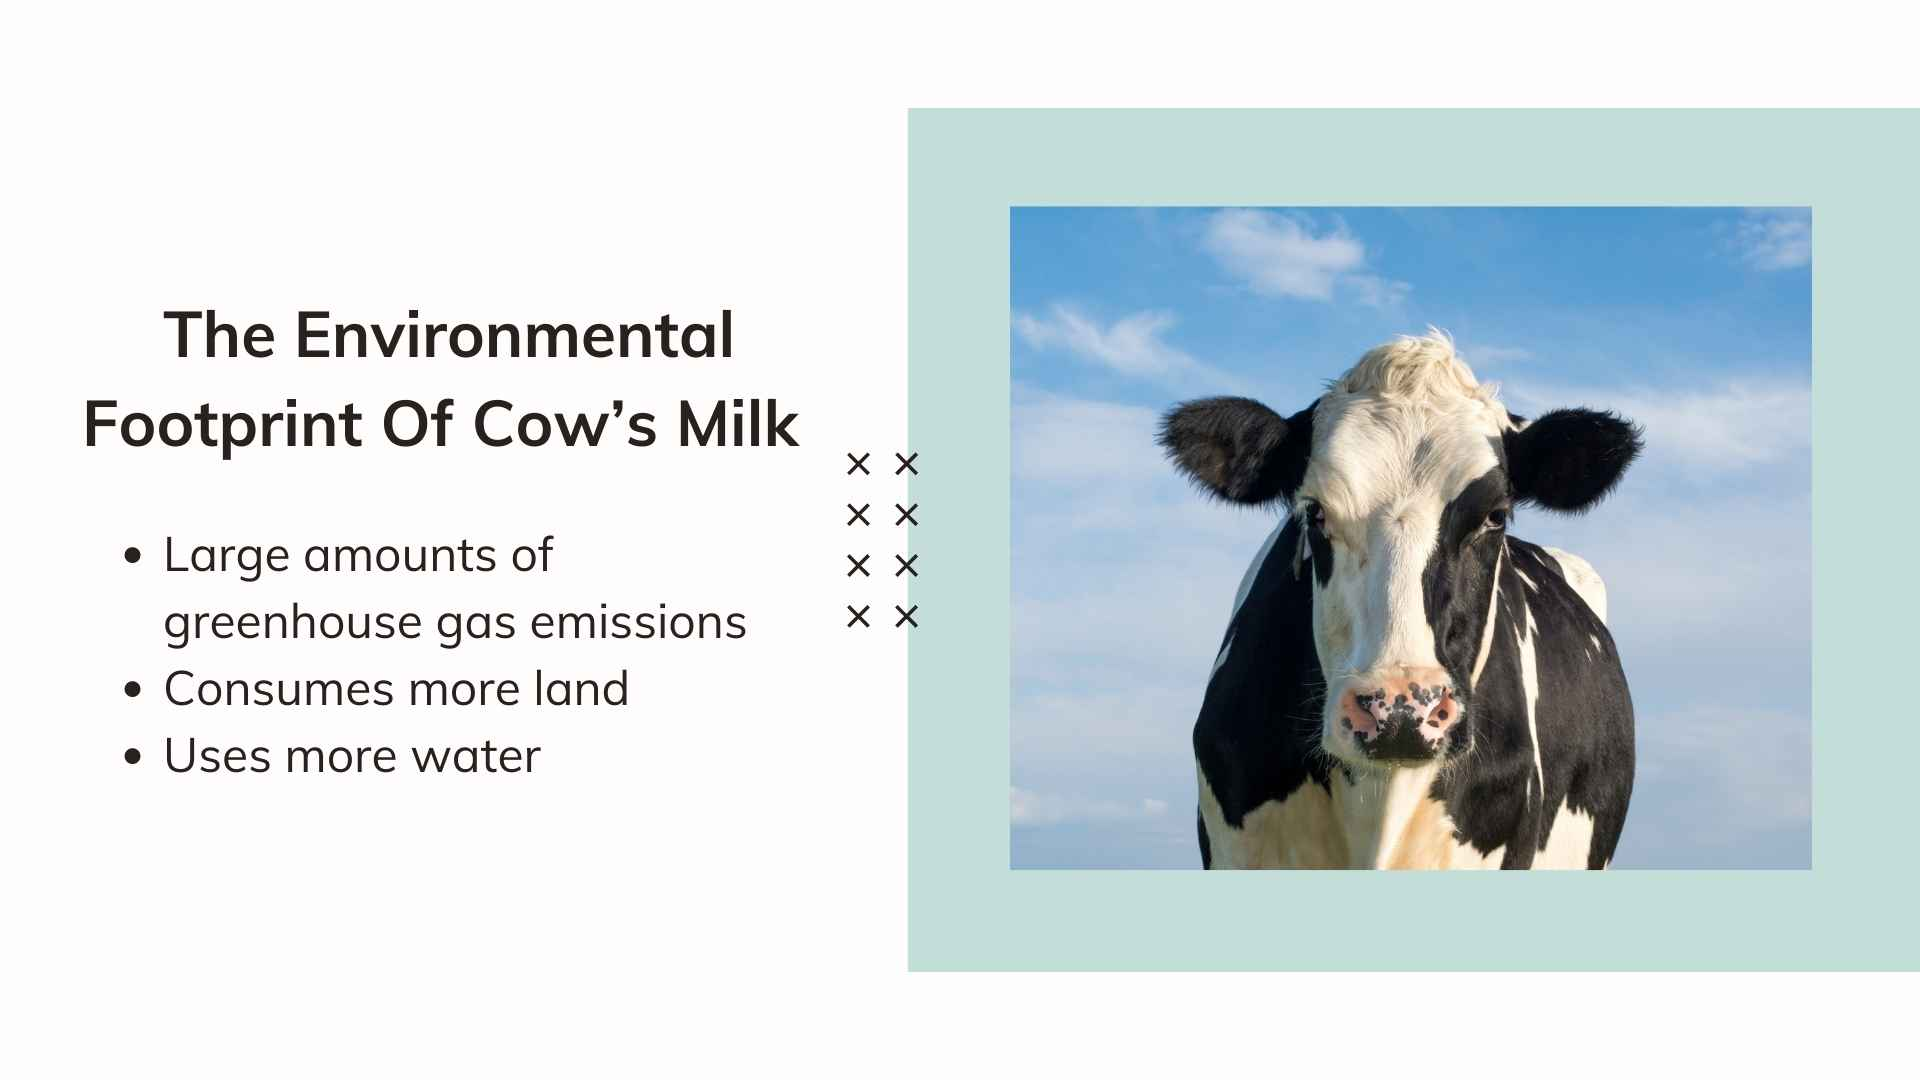 The Environmental Footprint Of Cow's Milk